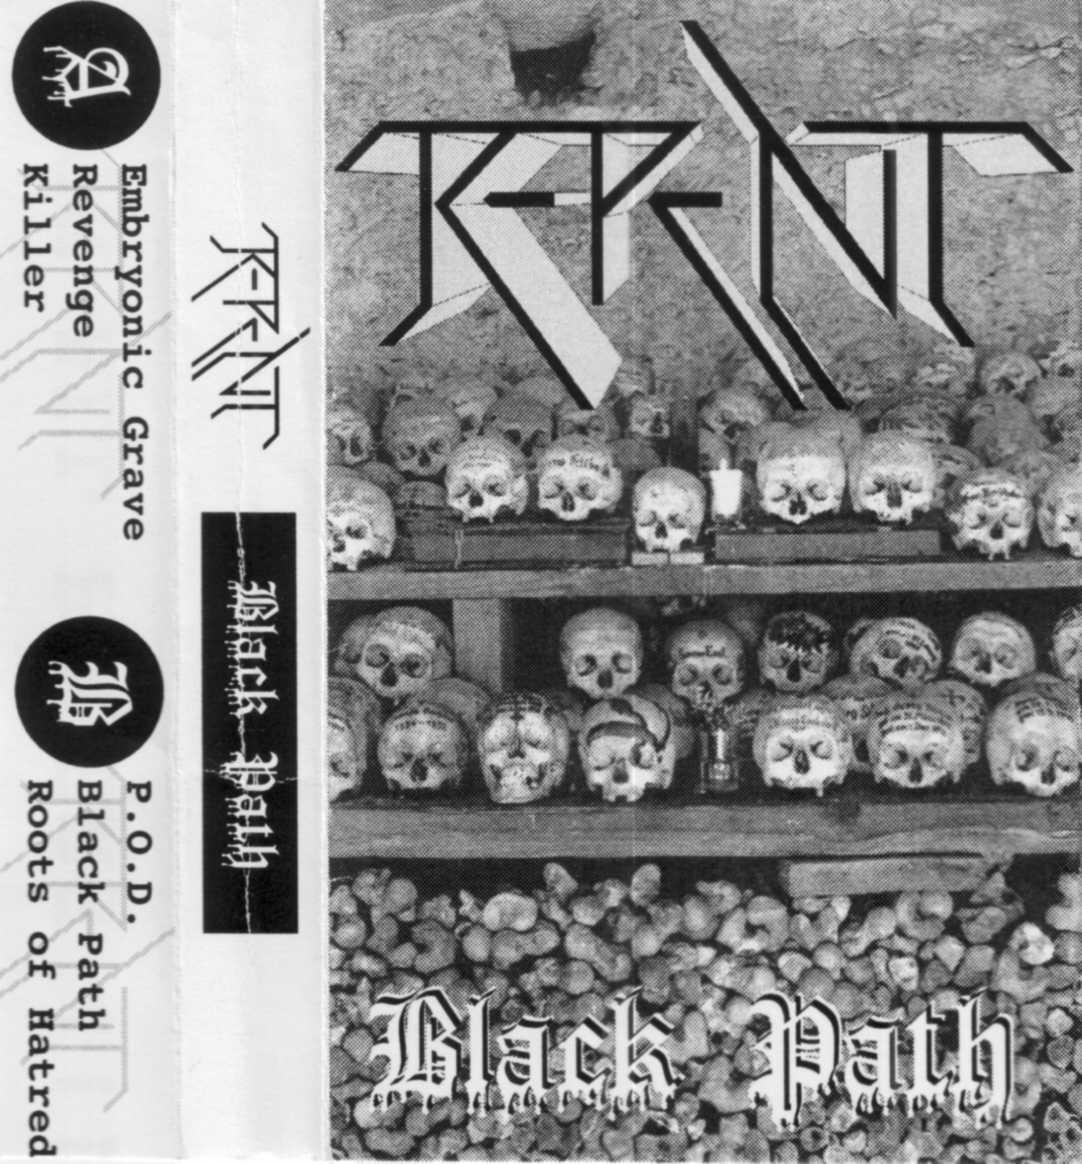 black-path-demo-cover.jpg